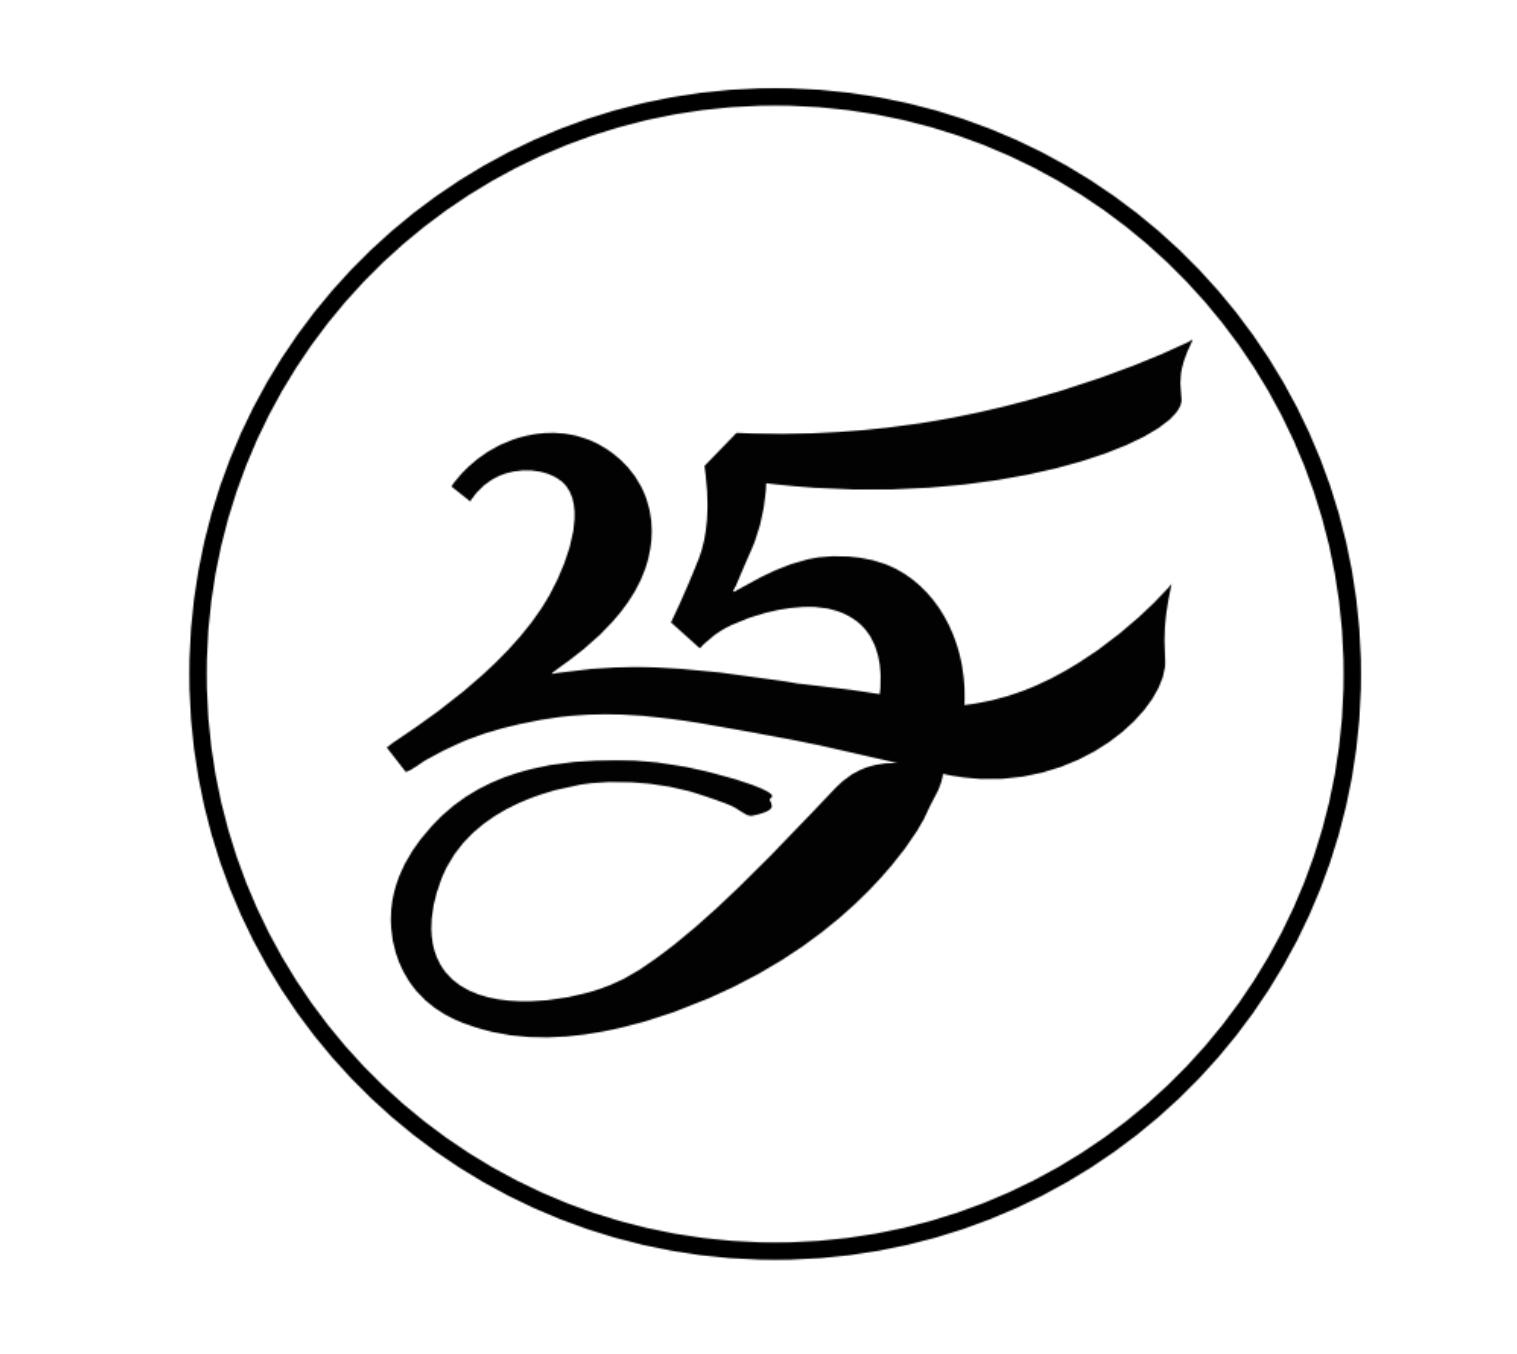 Le 25